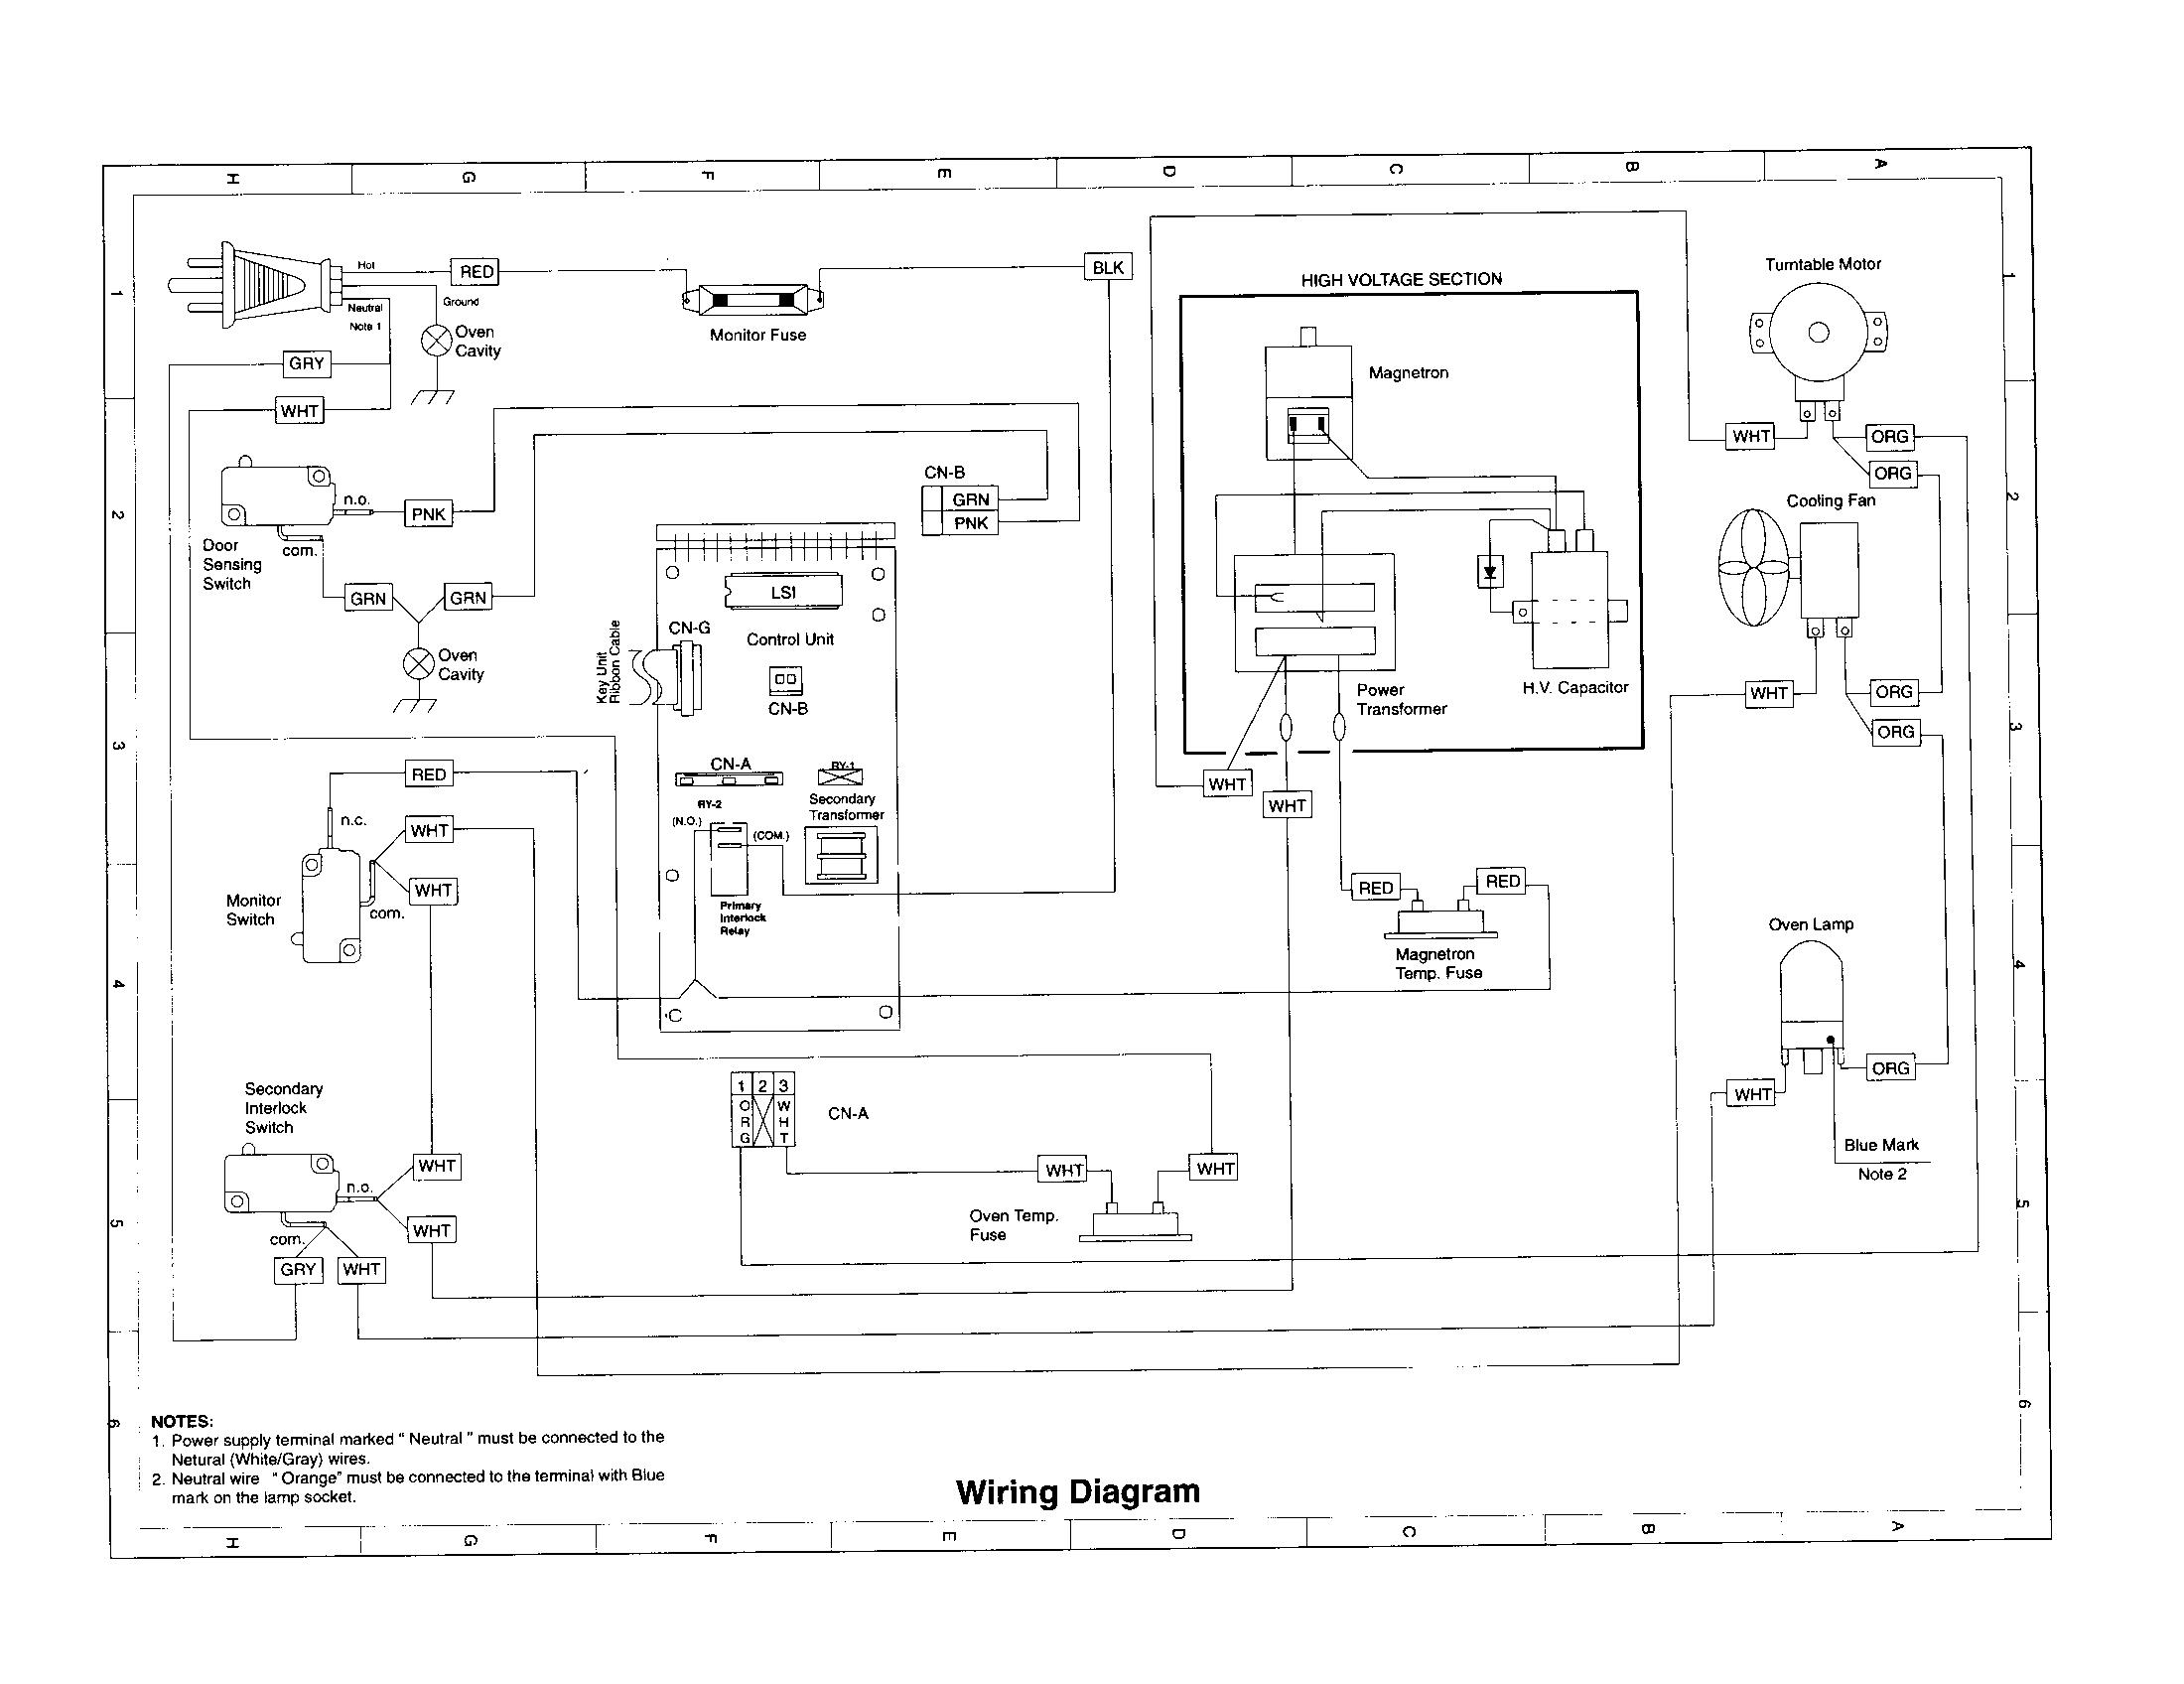 Wiring Diagram  33 Sharp Carousel Microwave Parts Diagram